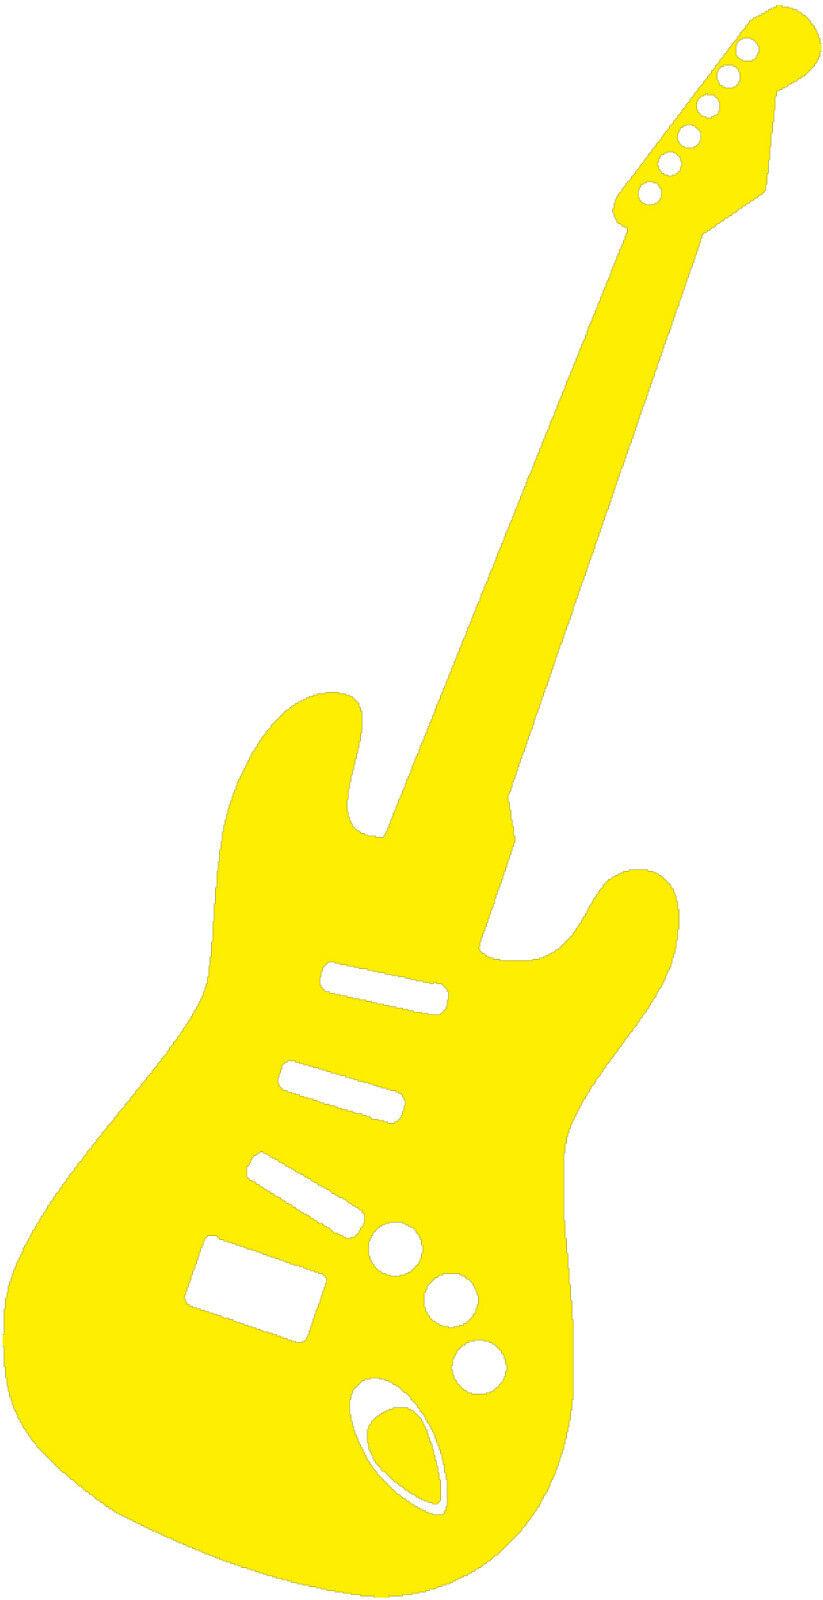 (AP0673 gelb) Applikation Dekor • Gitarre • versch. Größen | Verrückter Preis  | Zürich Online Shop